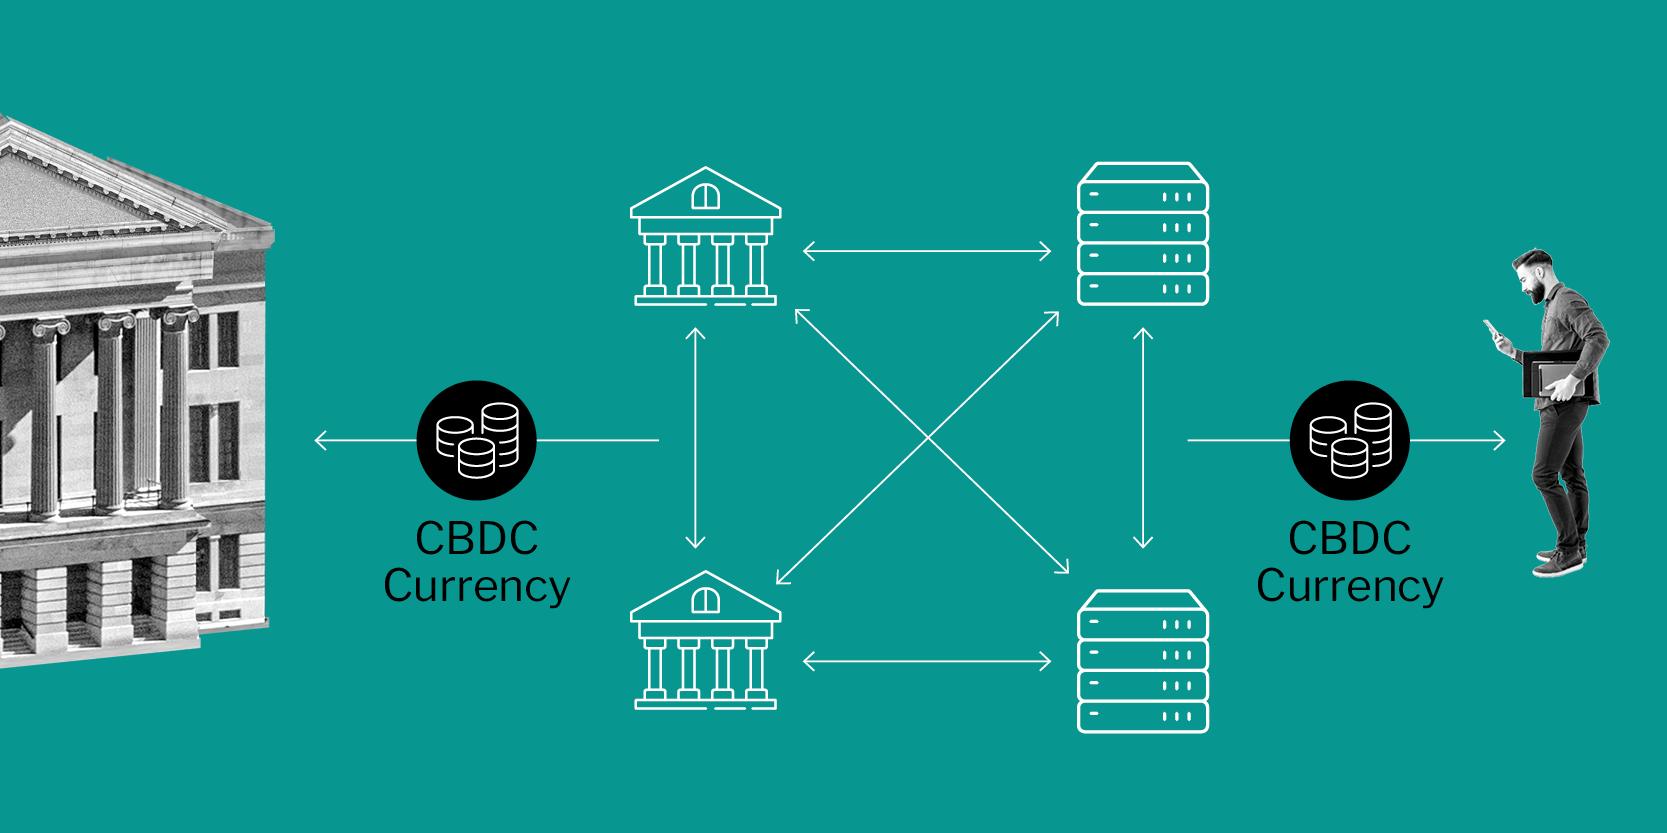 Illustration depicting an intermediated CBDC model